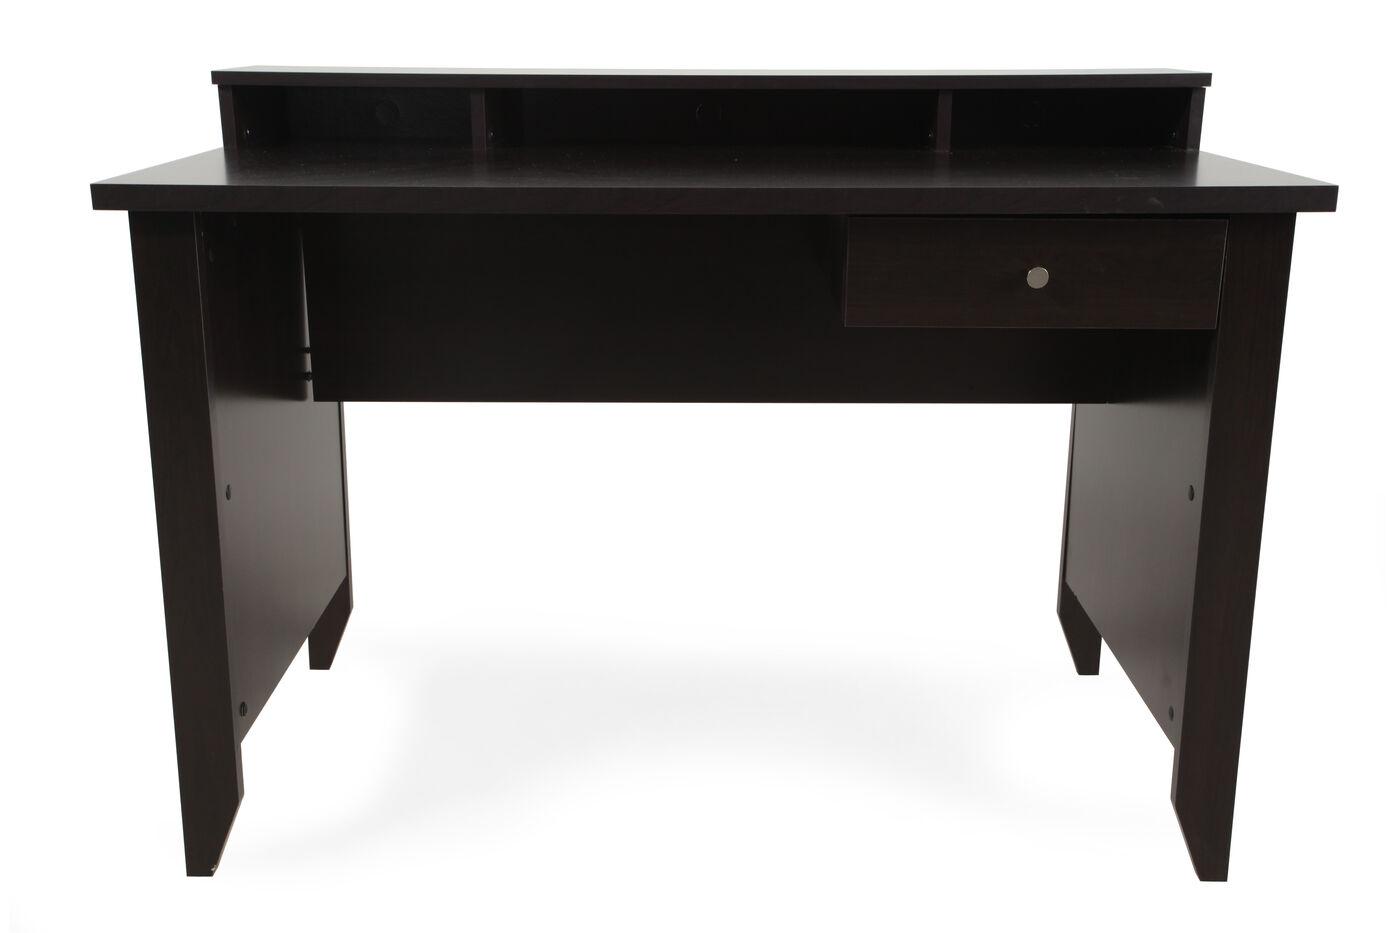 Sauder Cinnamon Cherry Desk Mathis Brothers Furniture